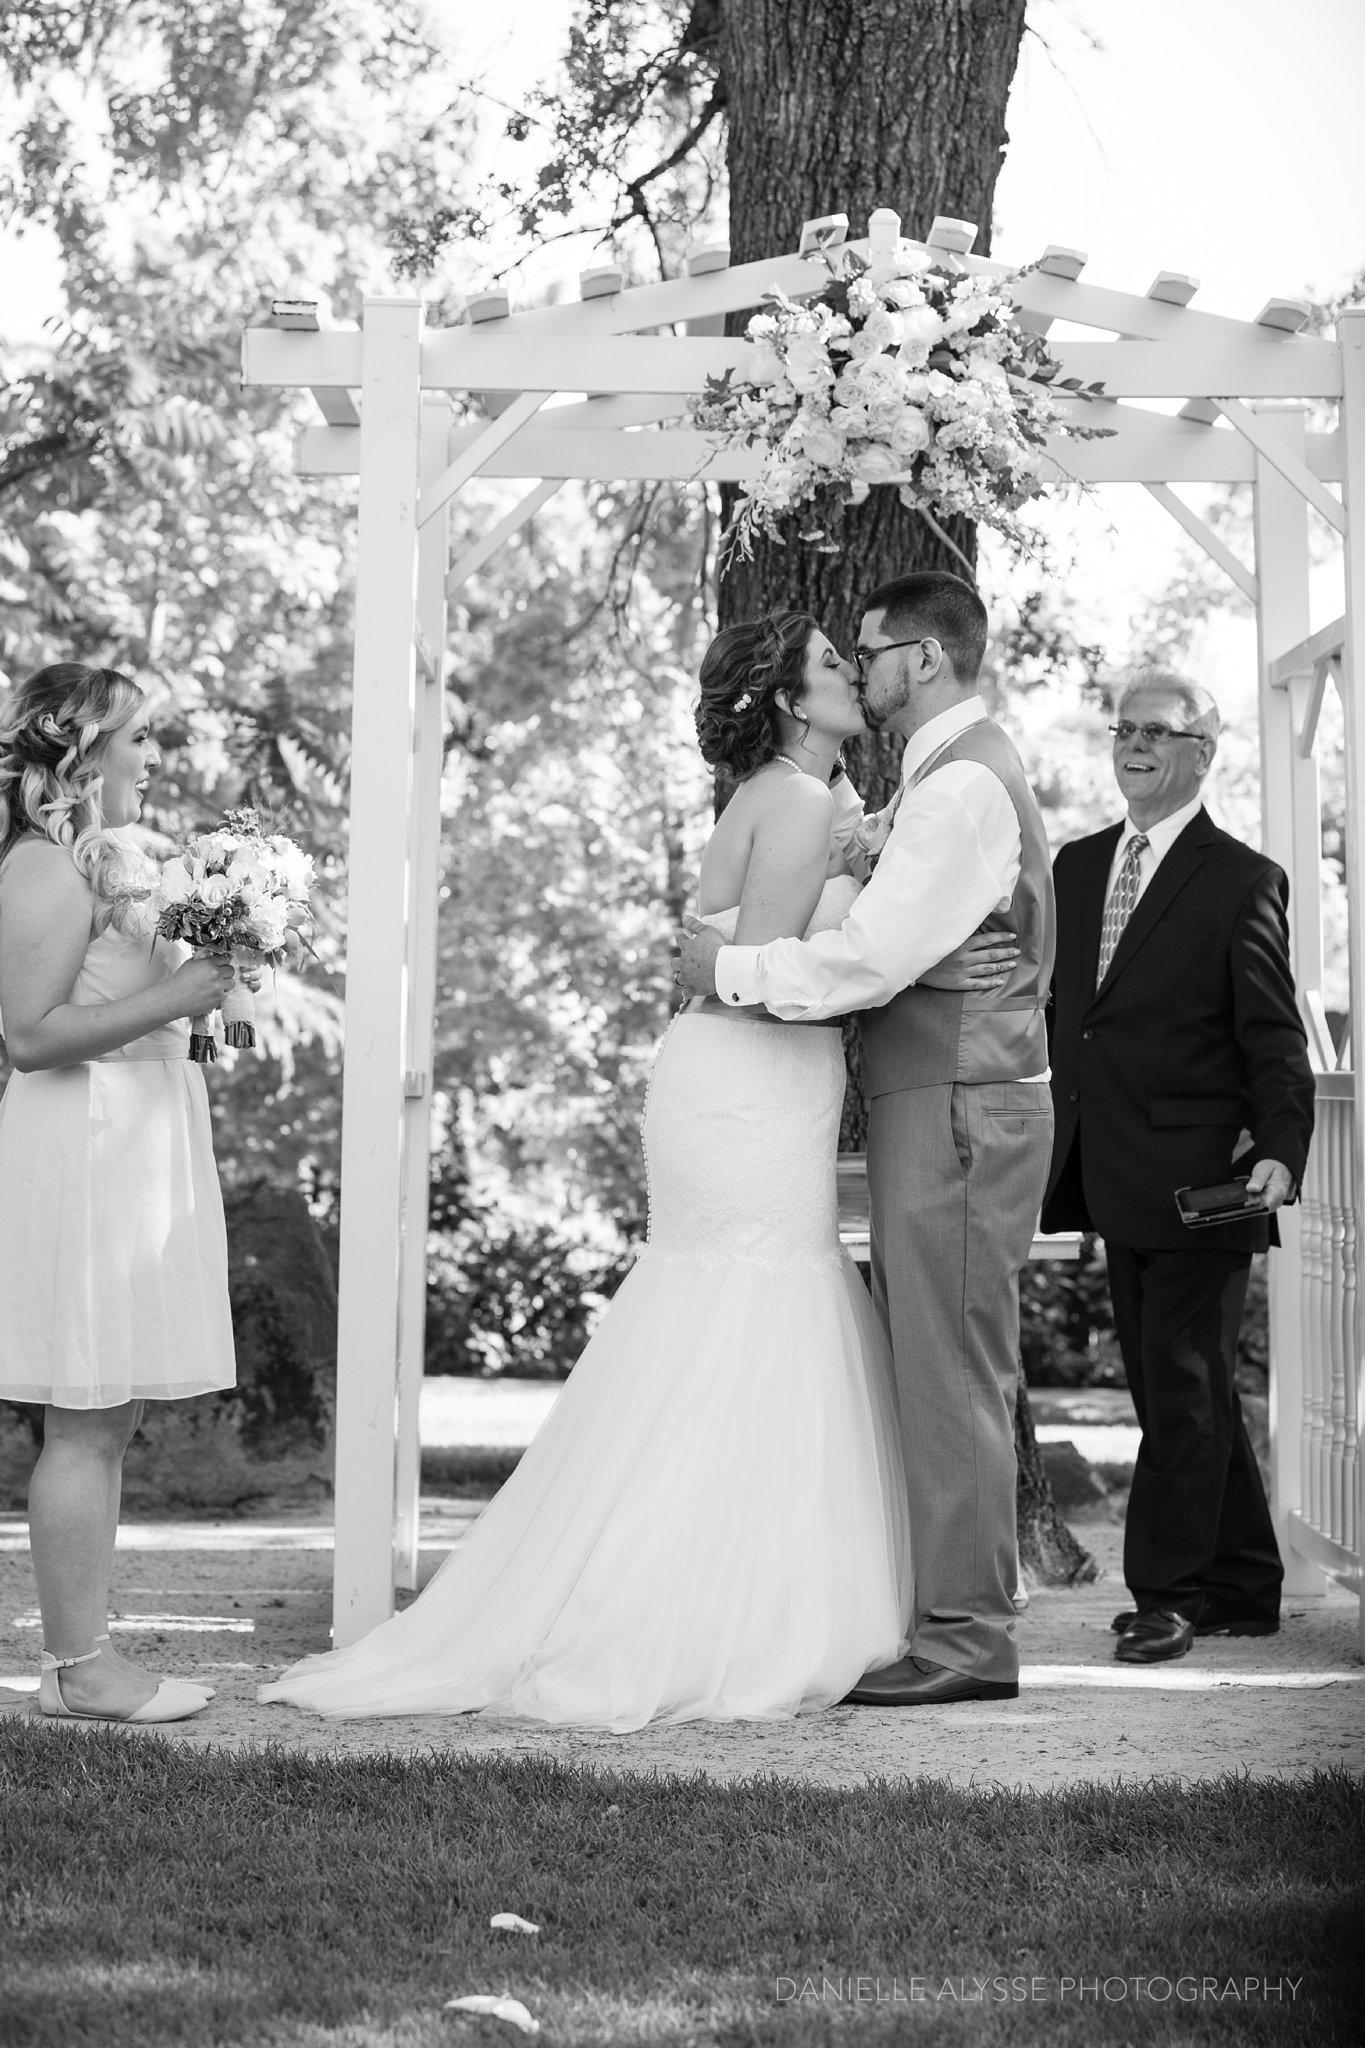 170507_blog_megan_david_wedding_loomis_flower_farm_inn_danielle_alysse_photography_sacramento_photographer0198_WEB.jpg